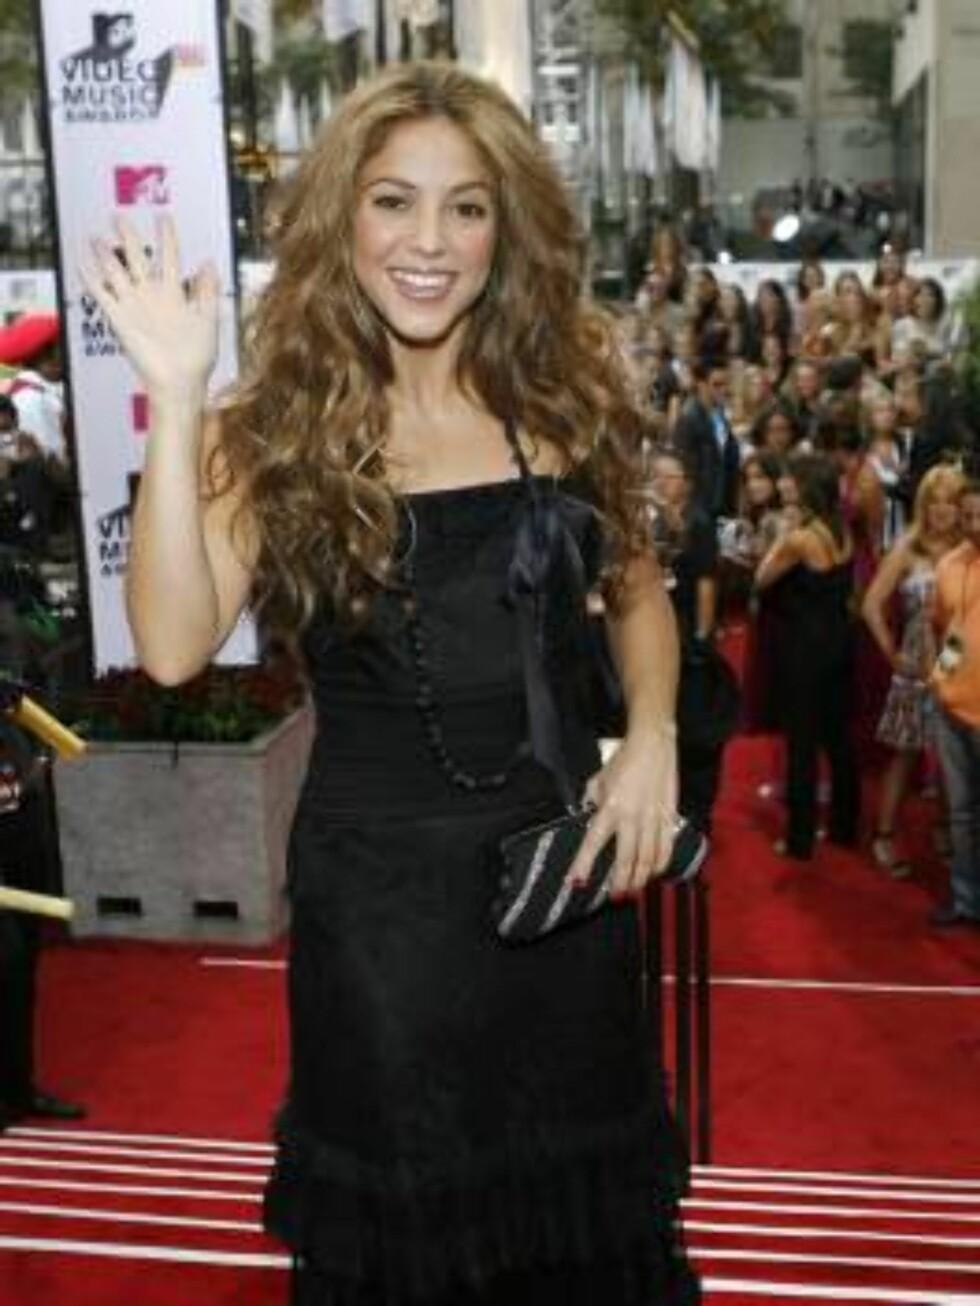 Shakira backstage the 2006 MTV Video Music Awards in New York, on Thursday, Aug. 31, 2006.  (AP Photo/Jason DeCrow) Foto: AP